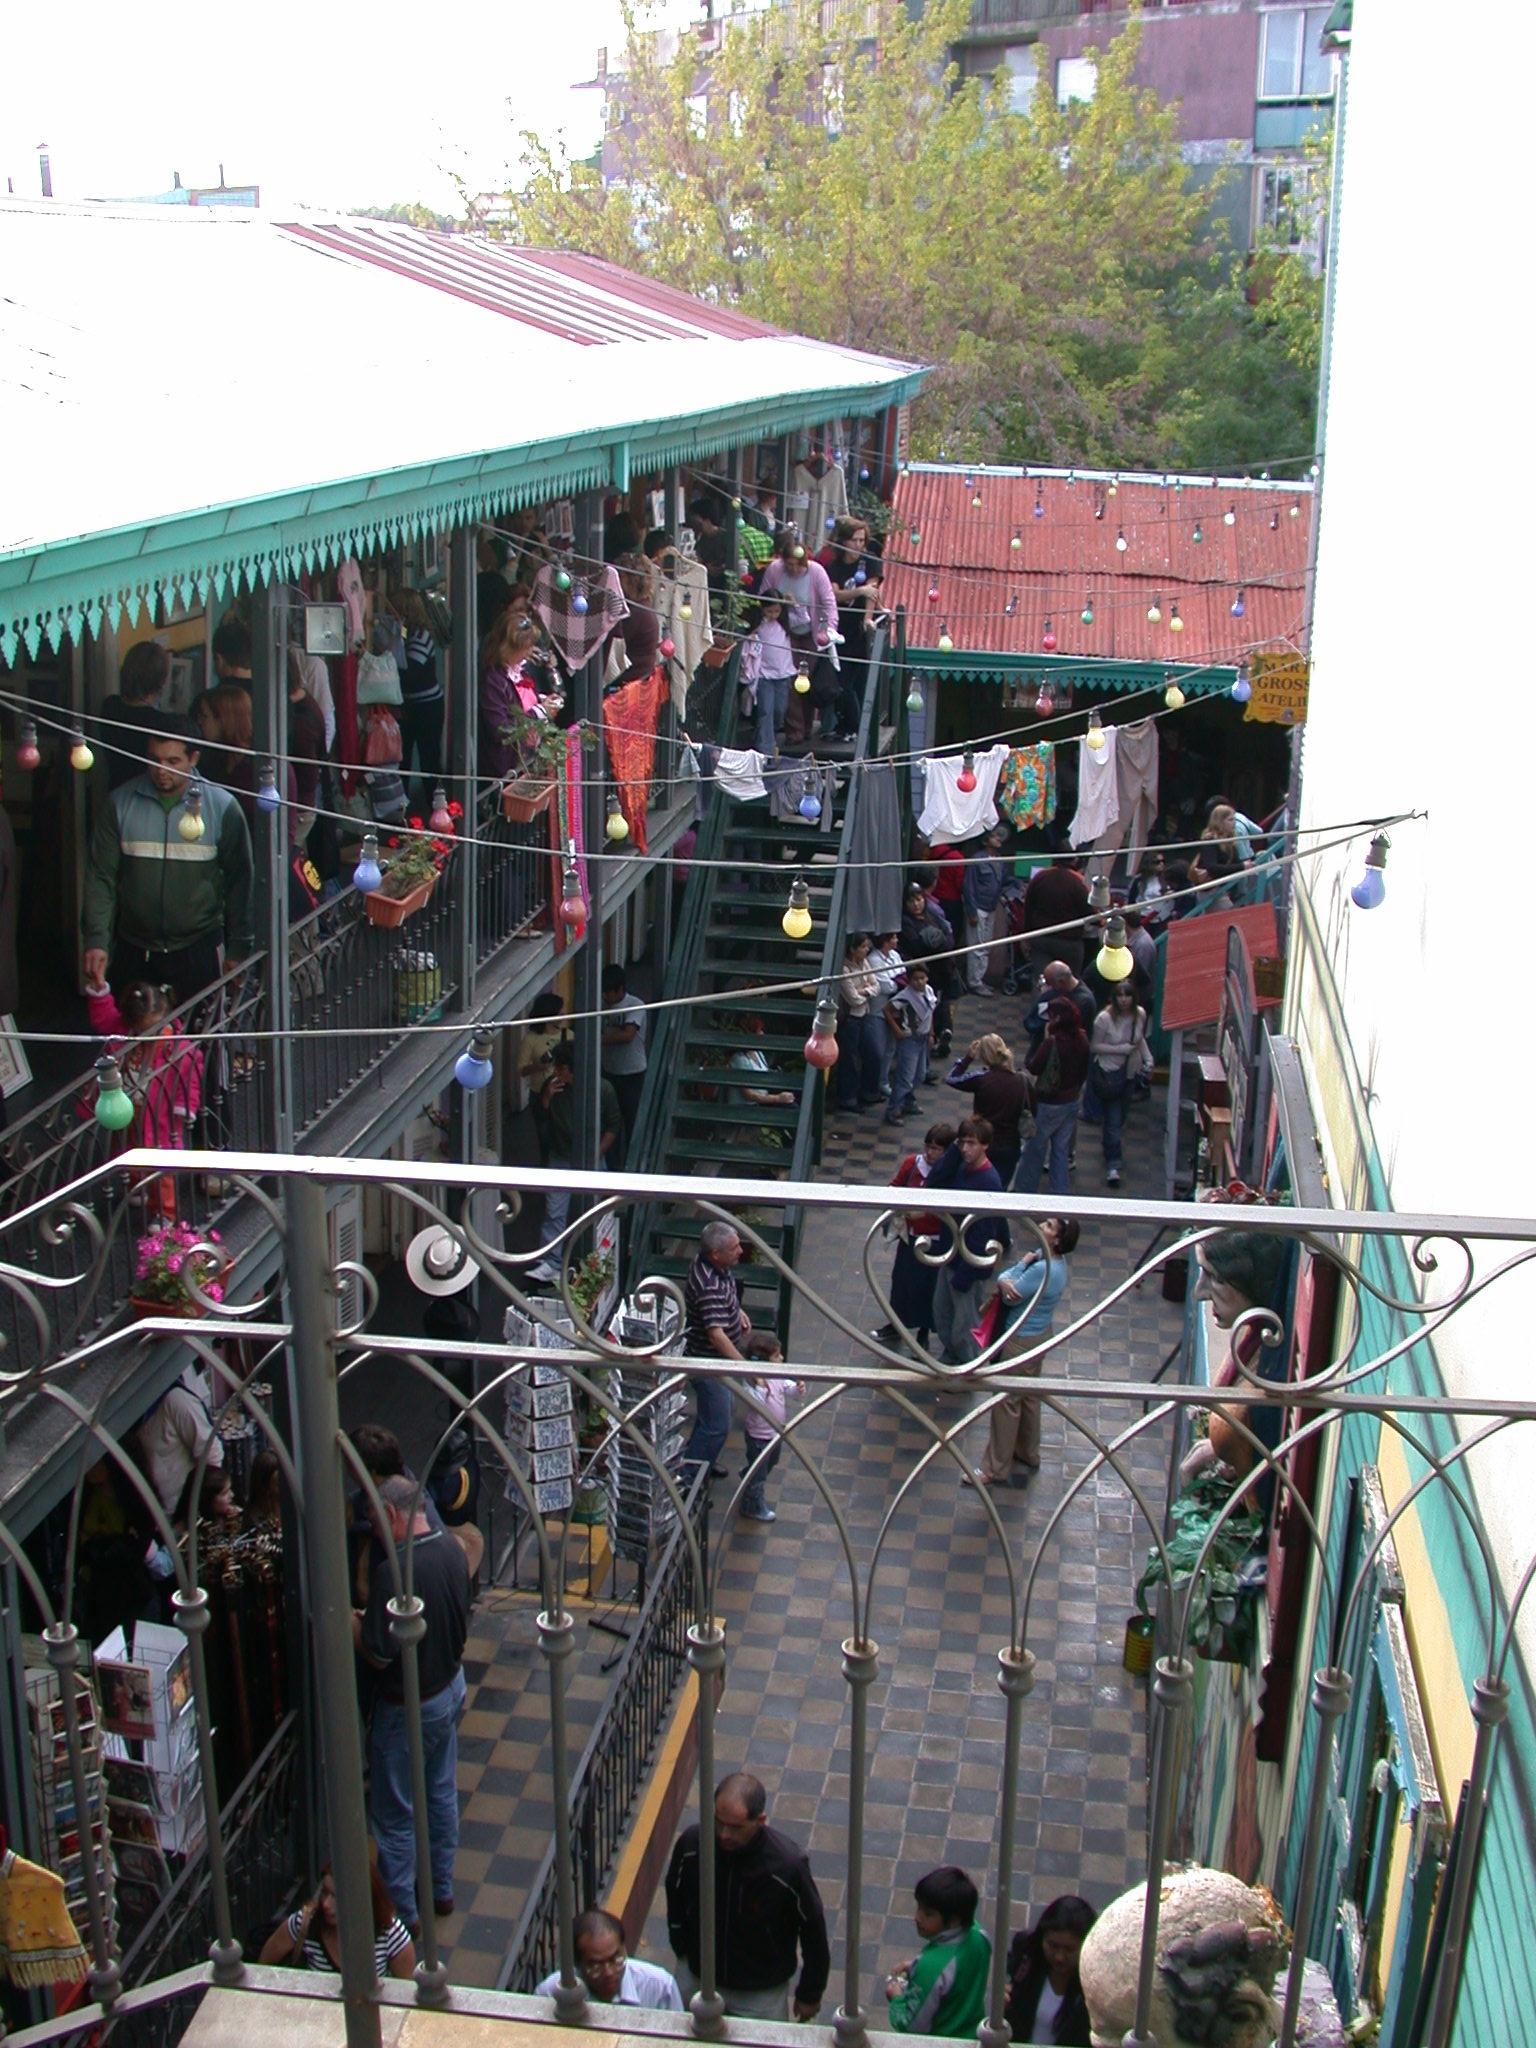 Immigrant Housing, La Boca, Buenos Aires, Argentina